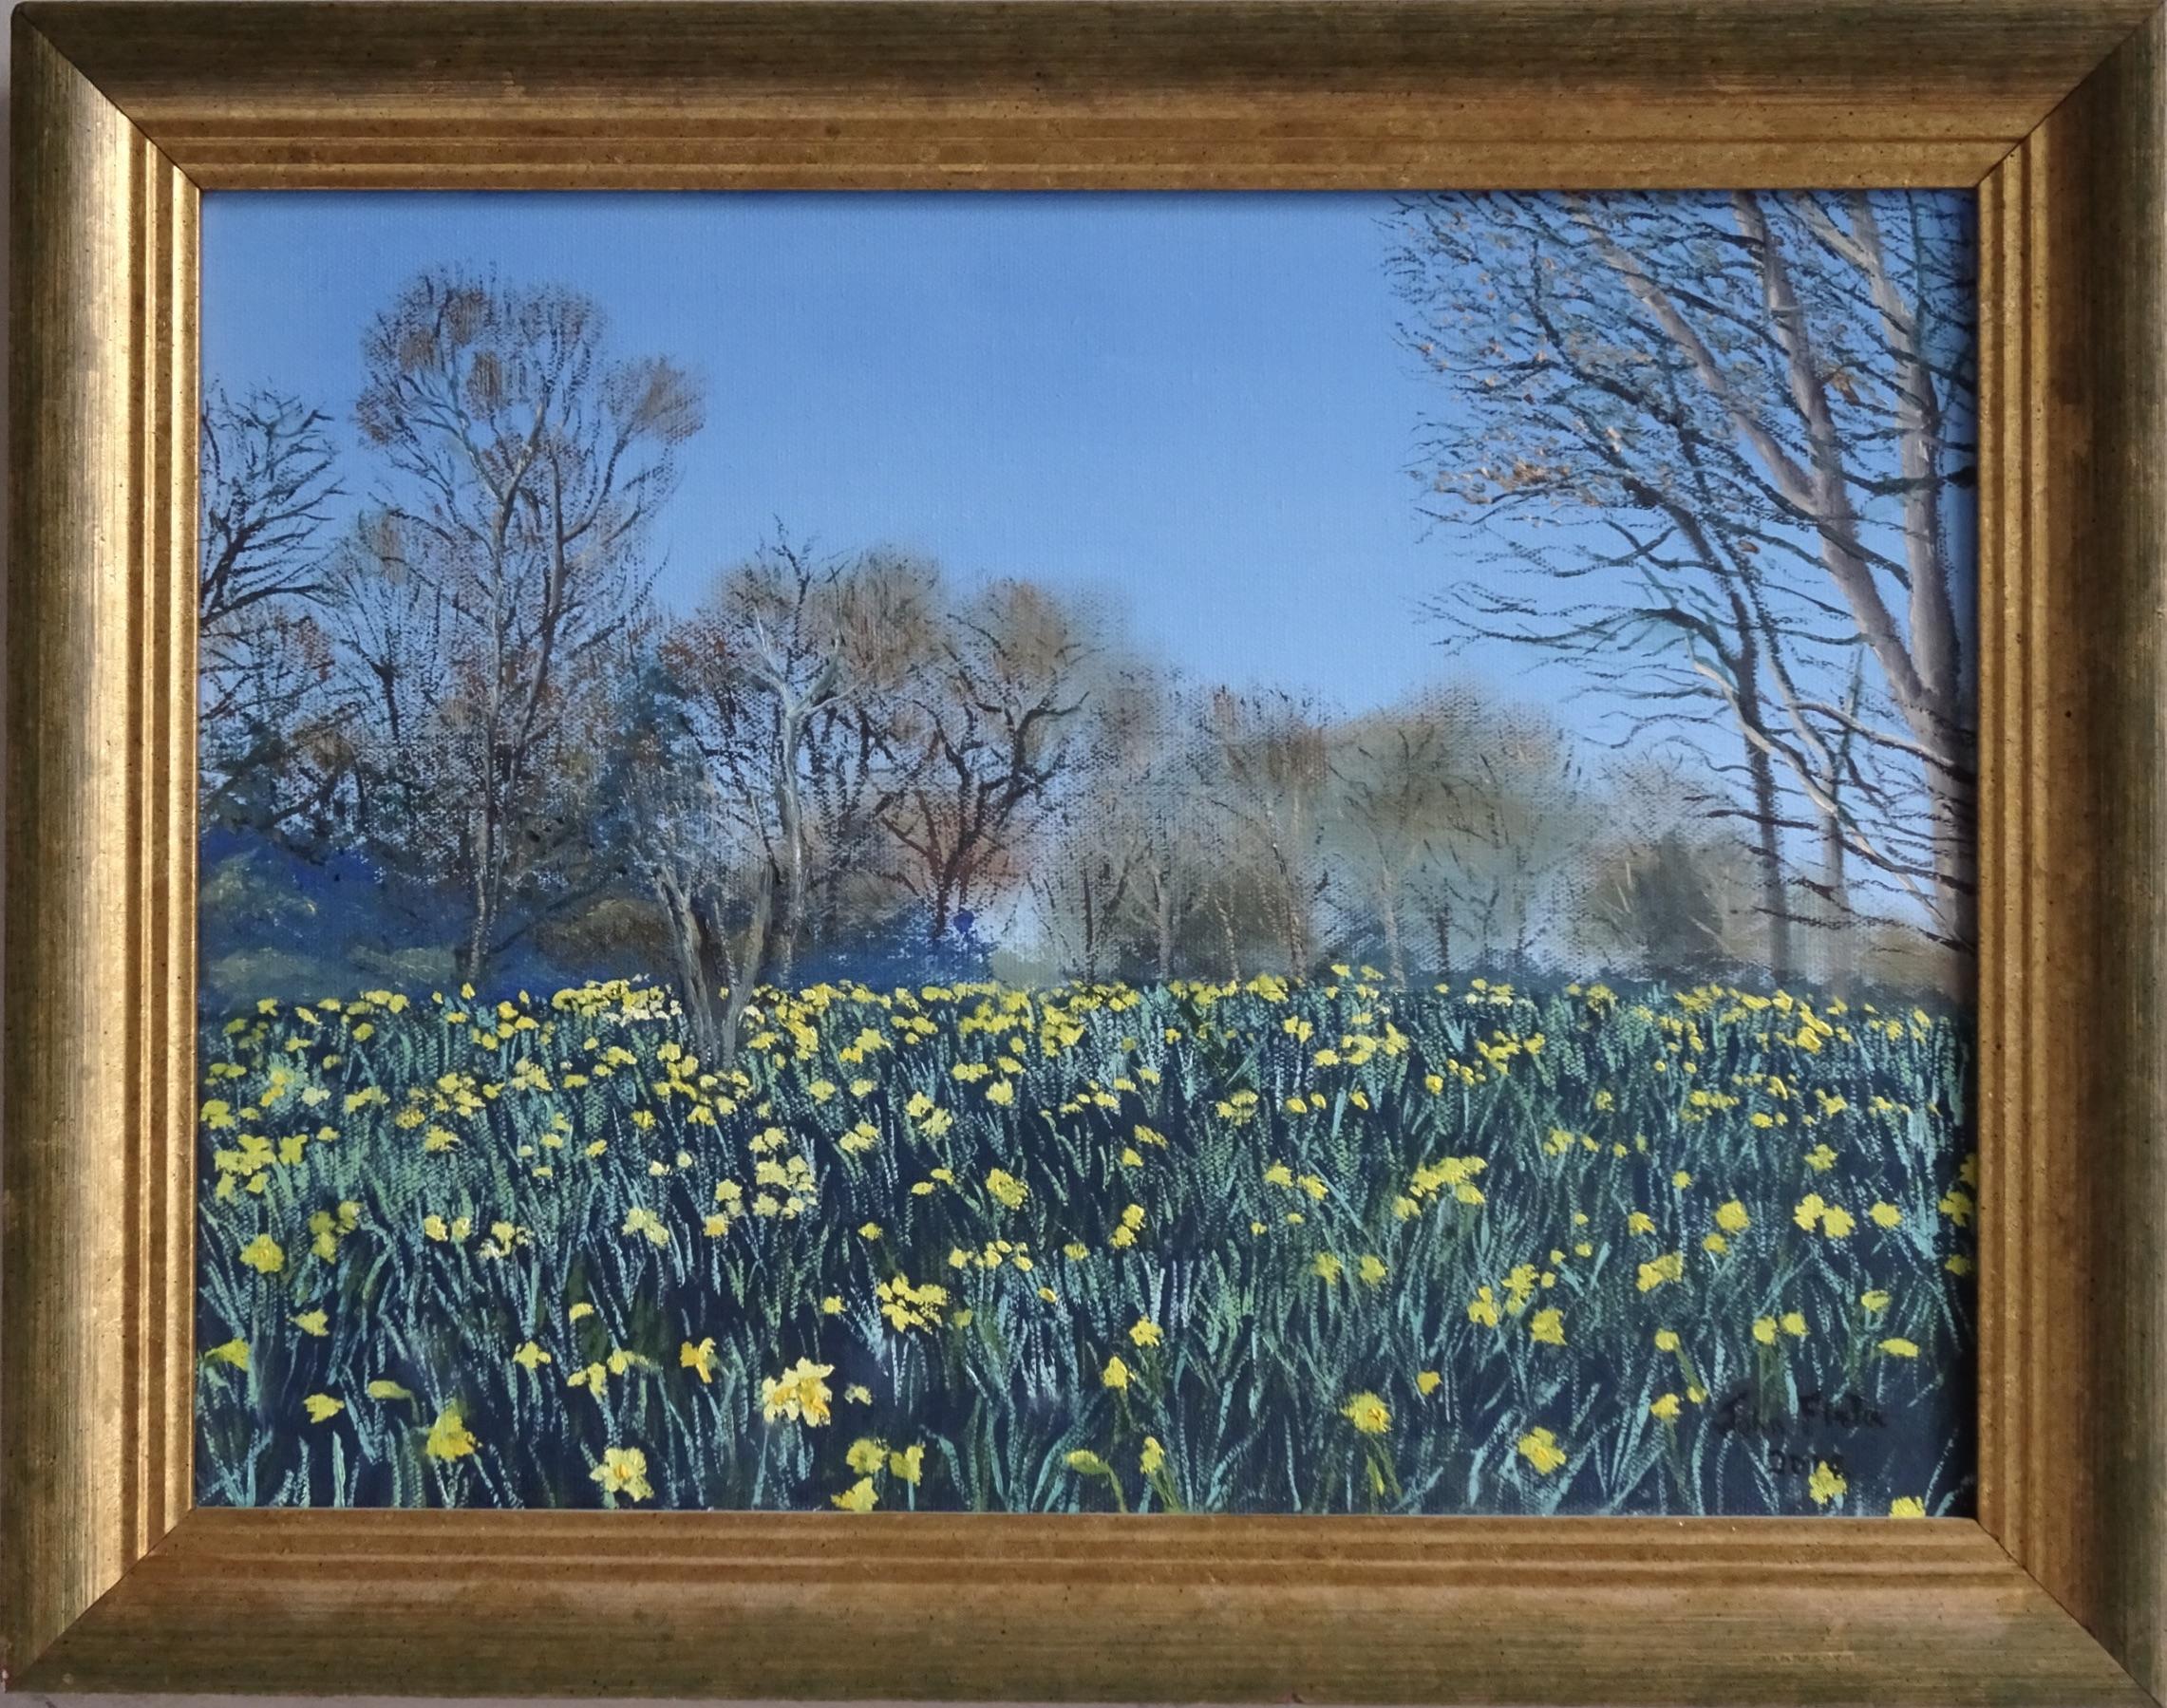 Daffodils in Cannizaro Park